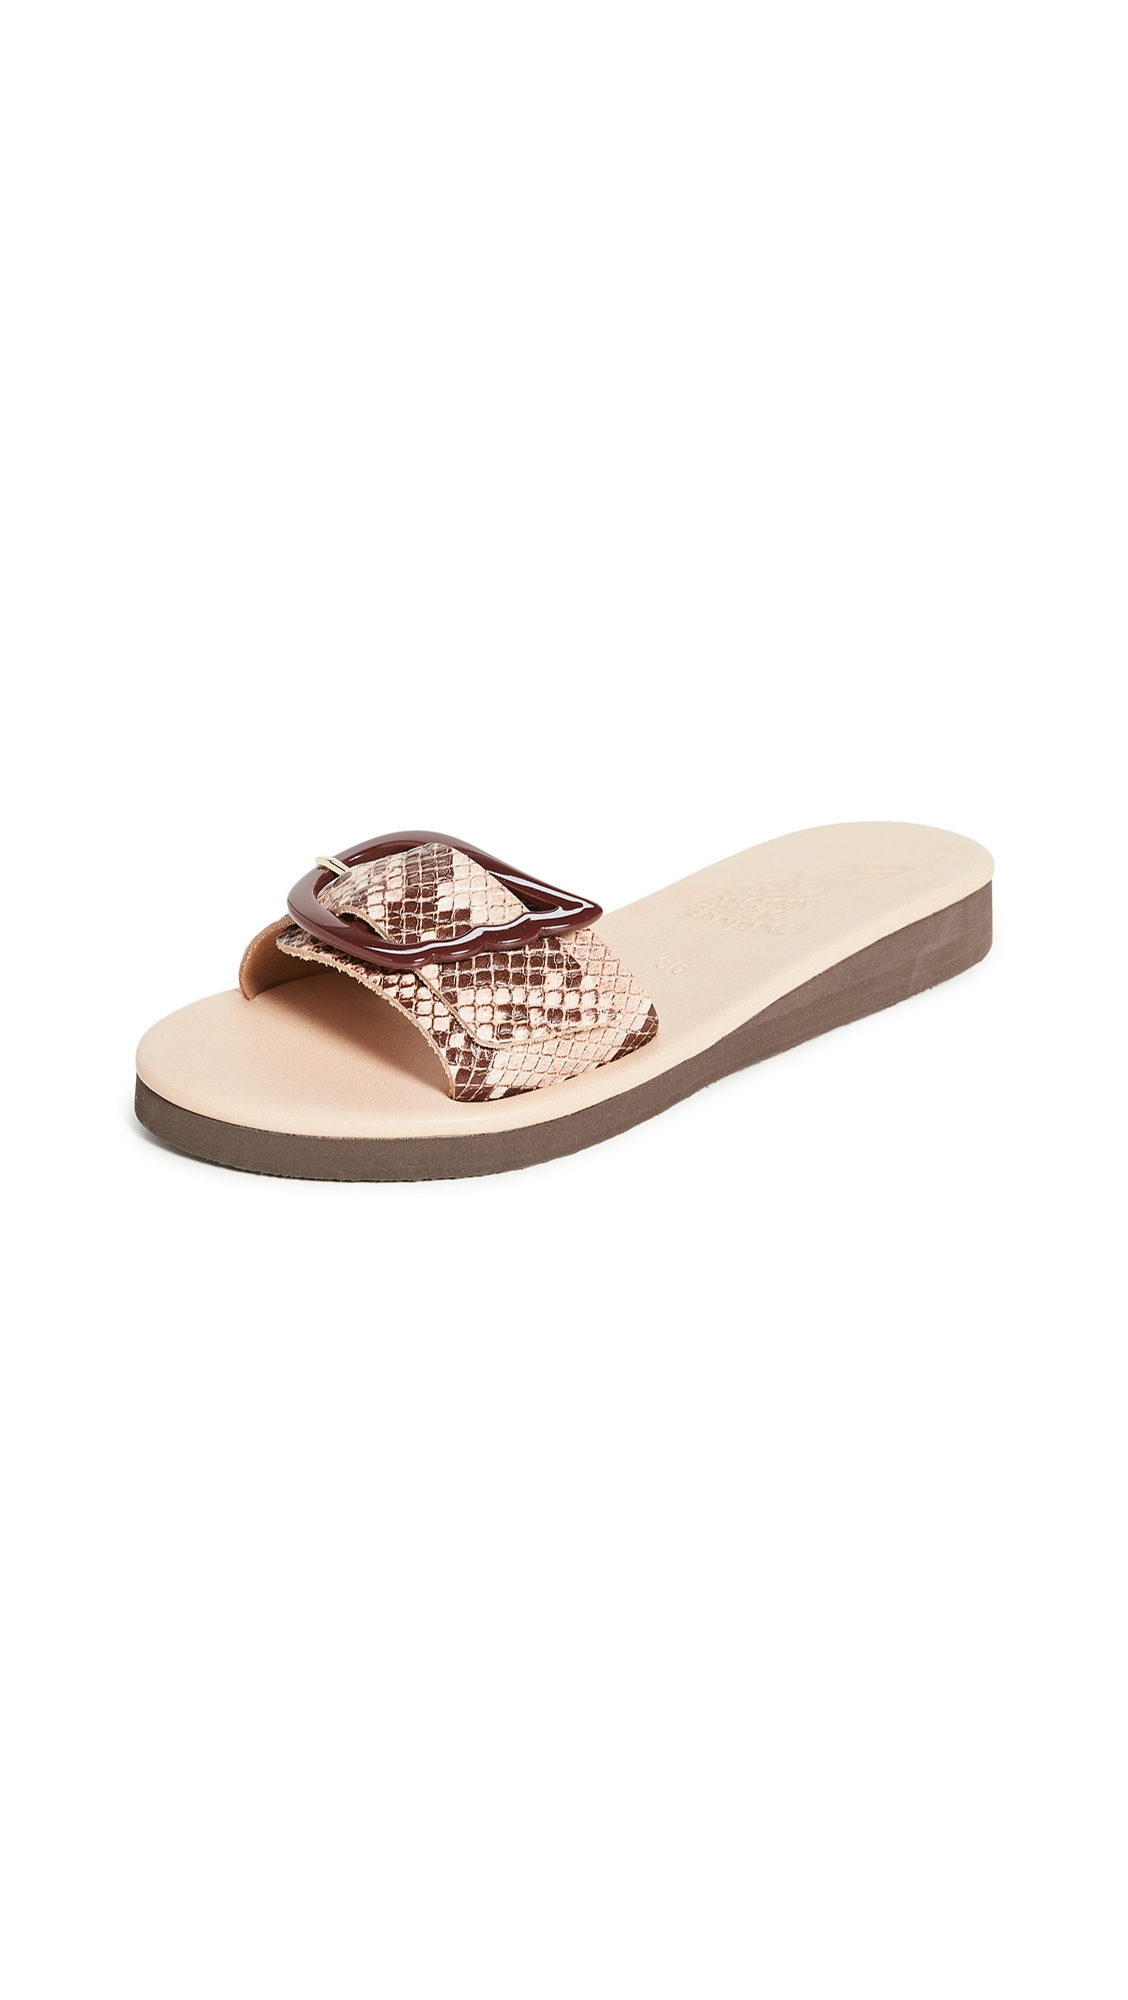 Buy Ancient Greek Sandals Aglaia Sandals online, shop Ancient Greek Sandals